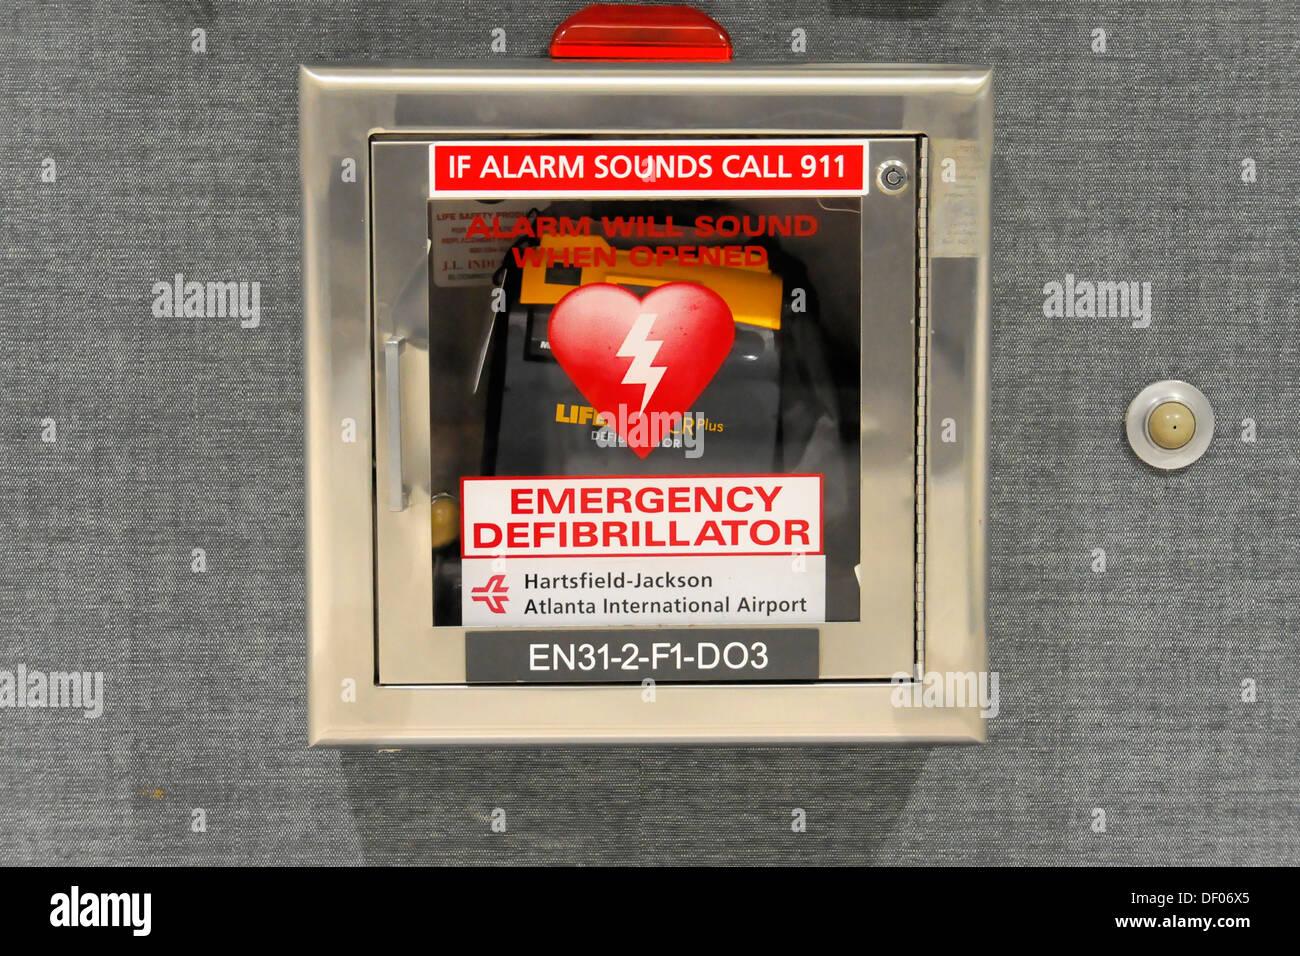 Defibrillator, Hartsfield-Jackson Atlanta International Airport, Atlanta Airport, Atlanta, USA, North America - Stock Image